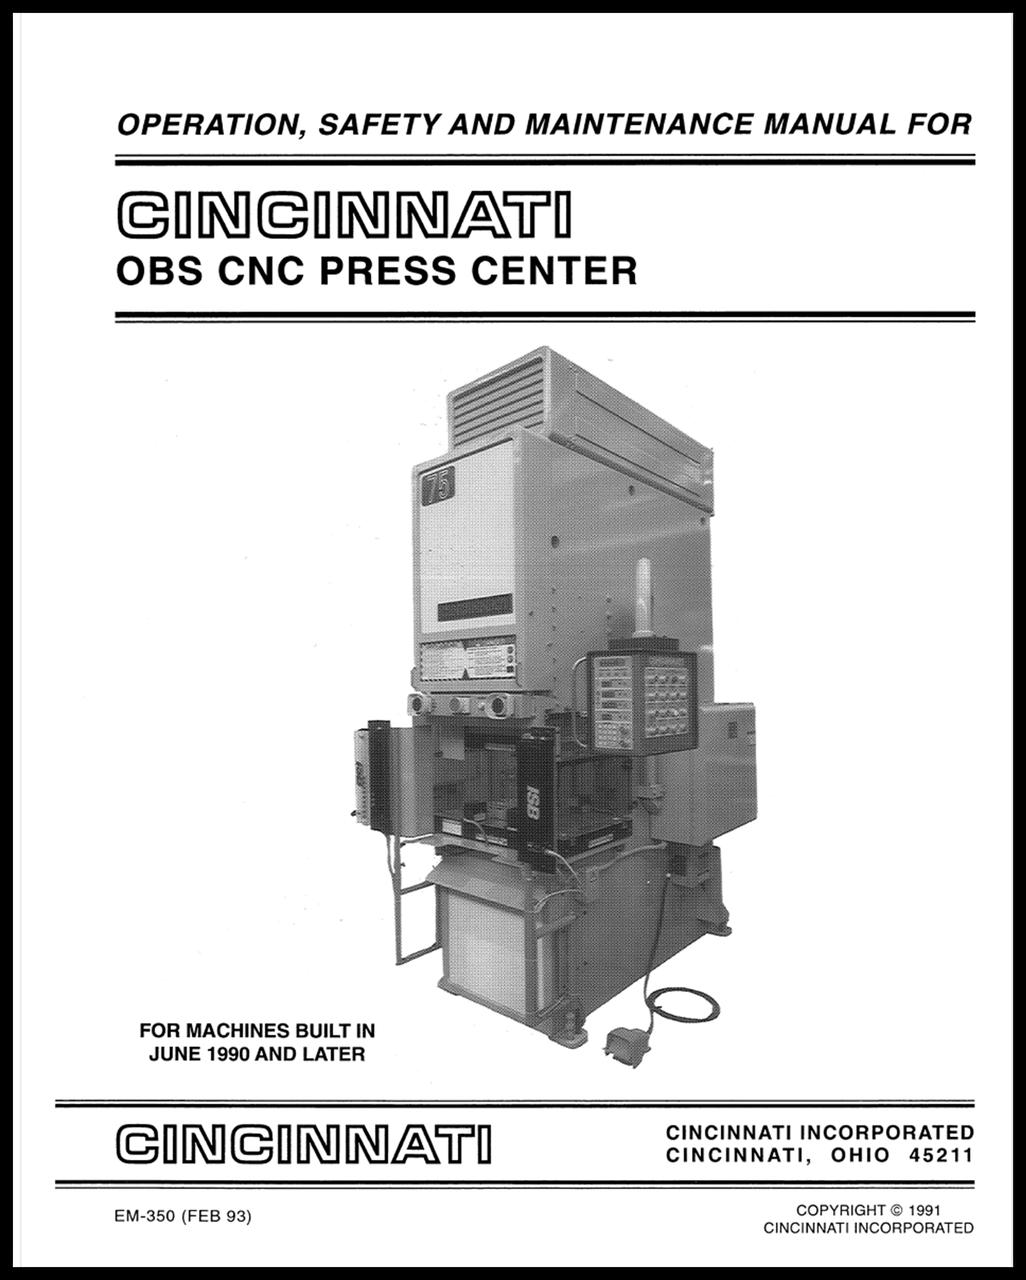 EM-350 (FEB 93) OBS CNC Press Center Operation, Safety and Maintenance